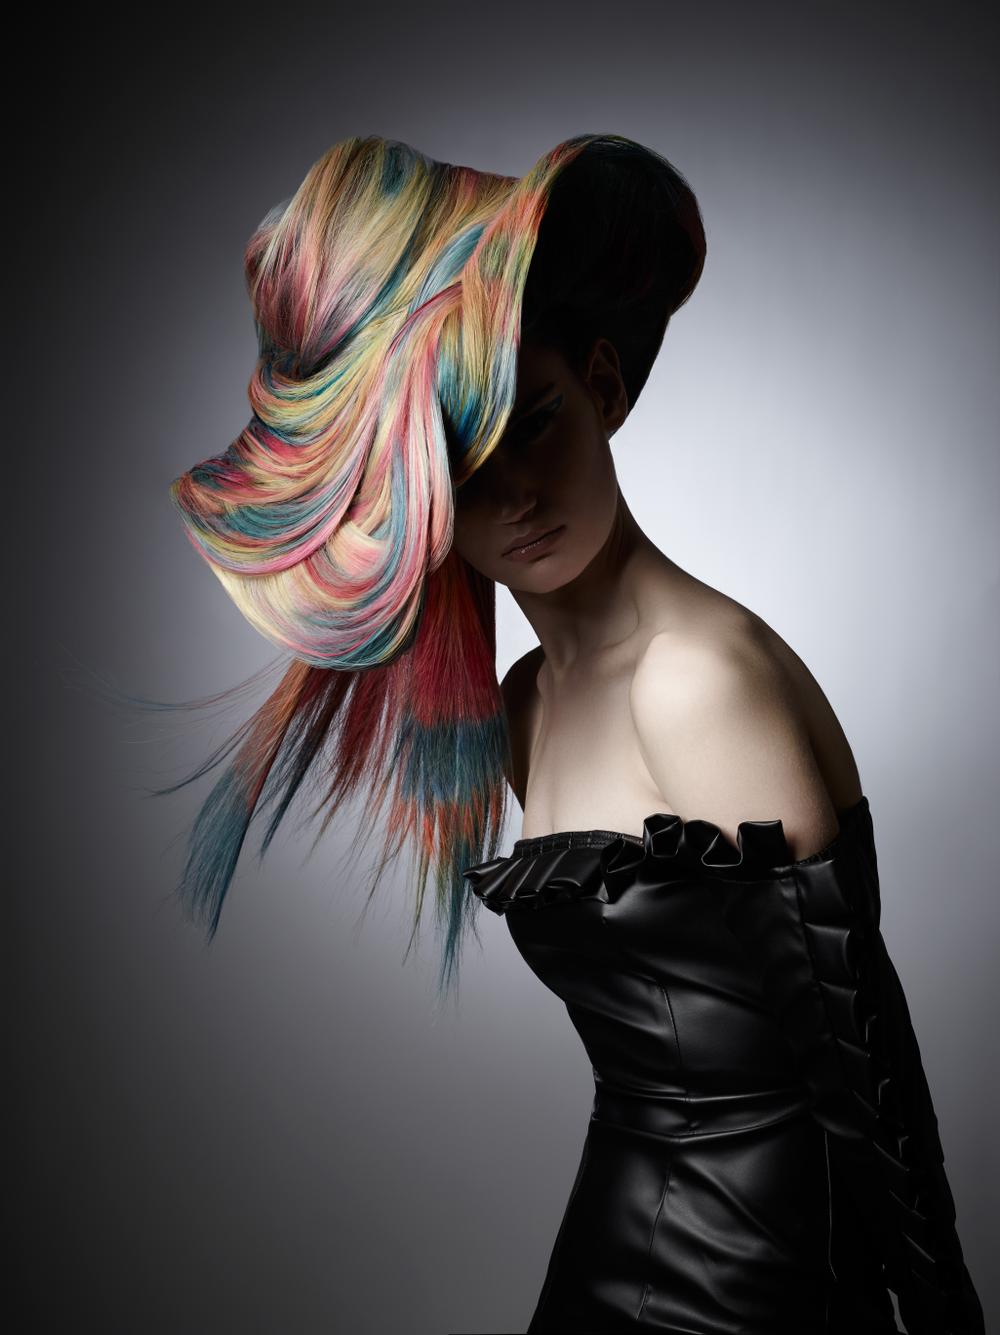 <strong>Vivienne Mackinder</strong>, Hairdesignertv.com in Riverhead, NY